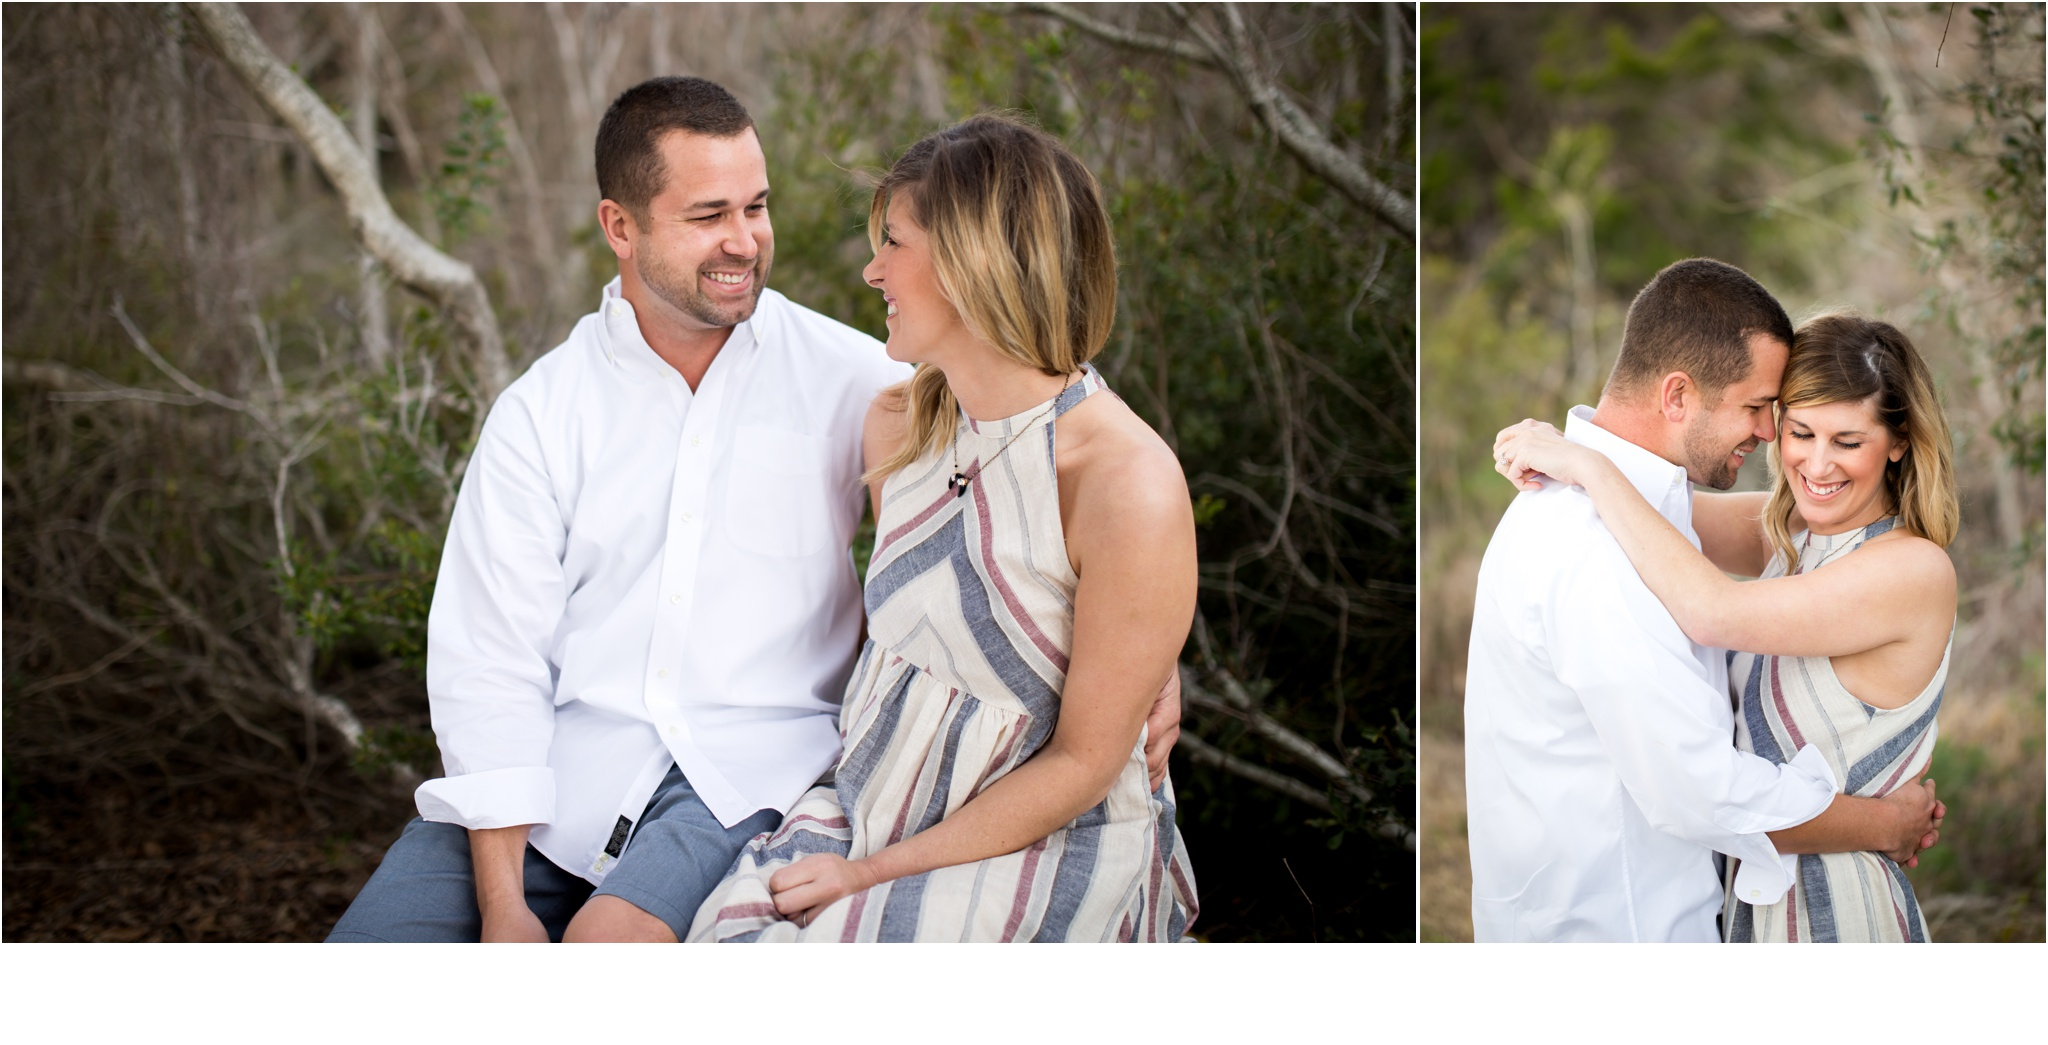 Rainey_Gregg_Photography_St._Simons_Island_Georgia_California_Wedding_Portrait_Photography_0563.jpg